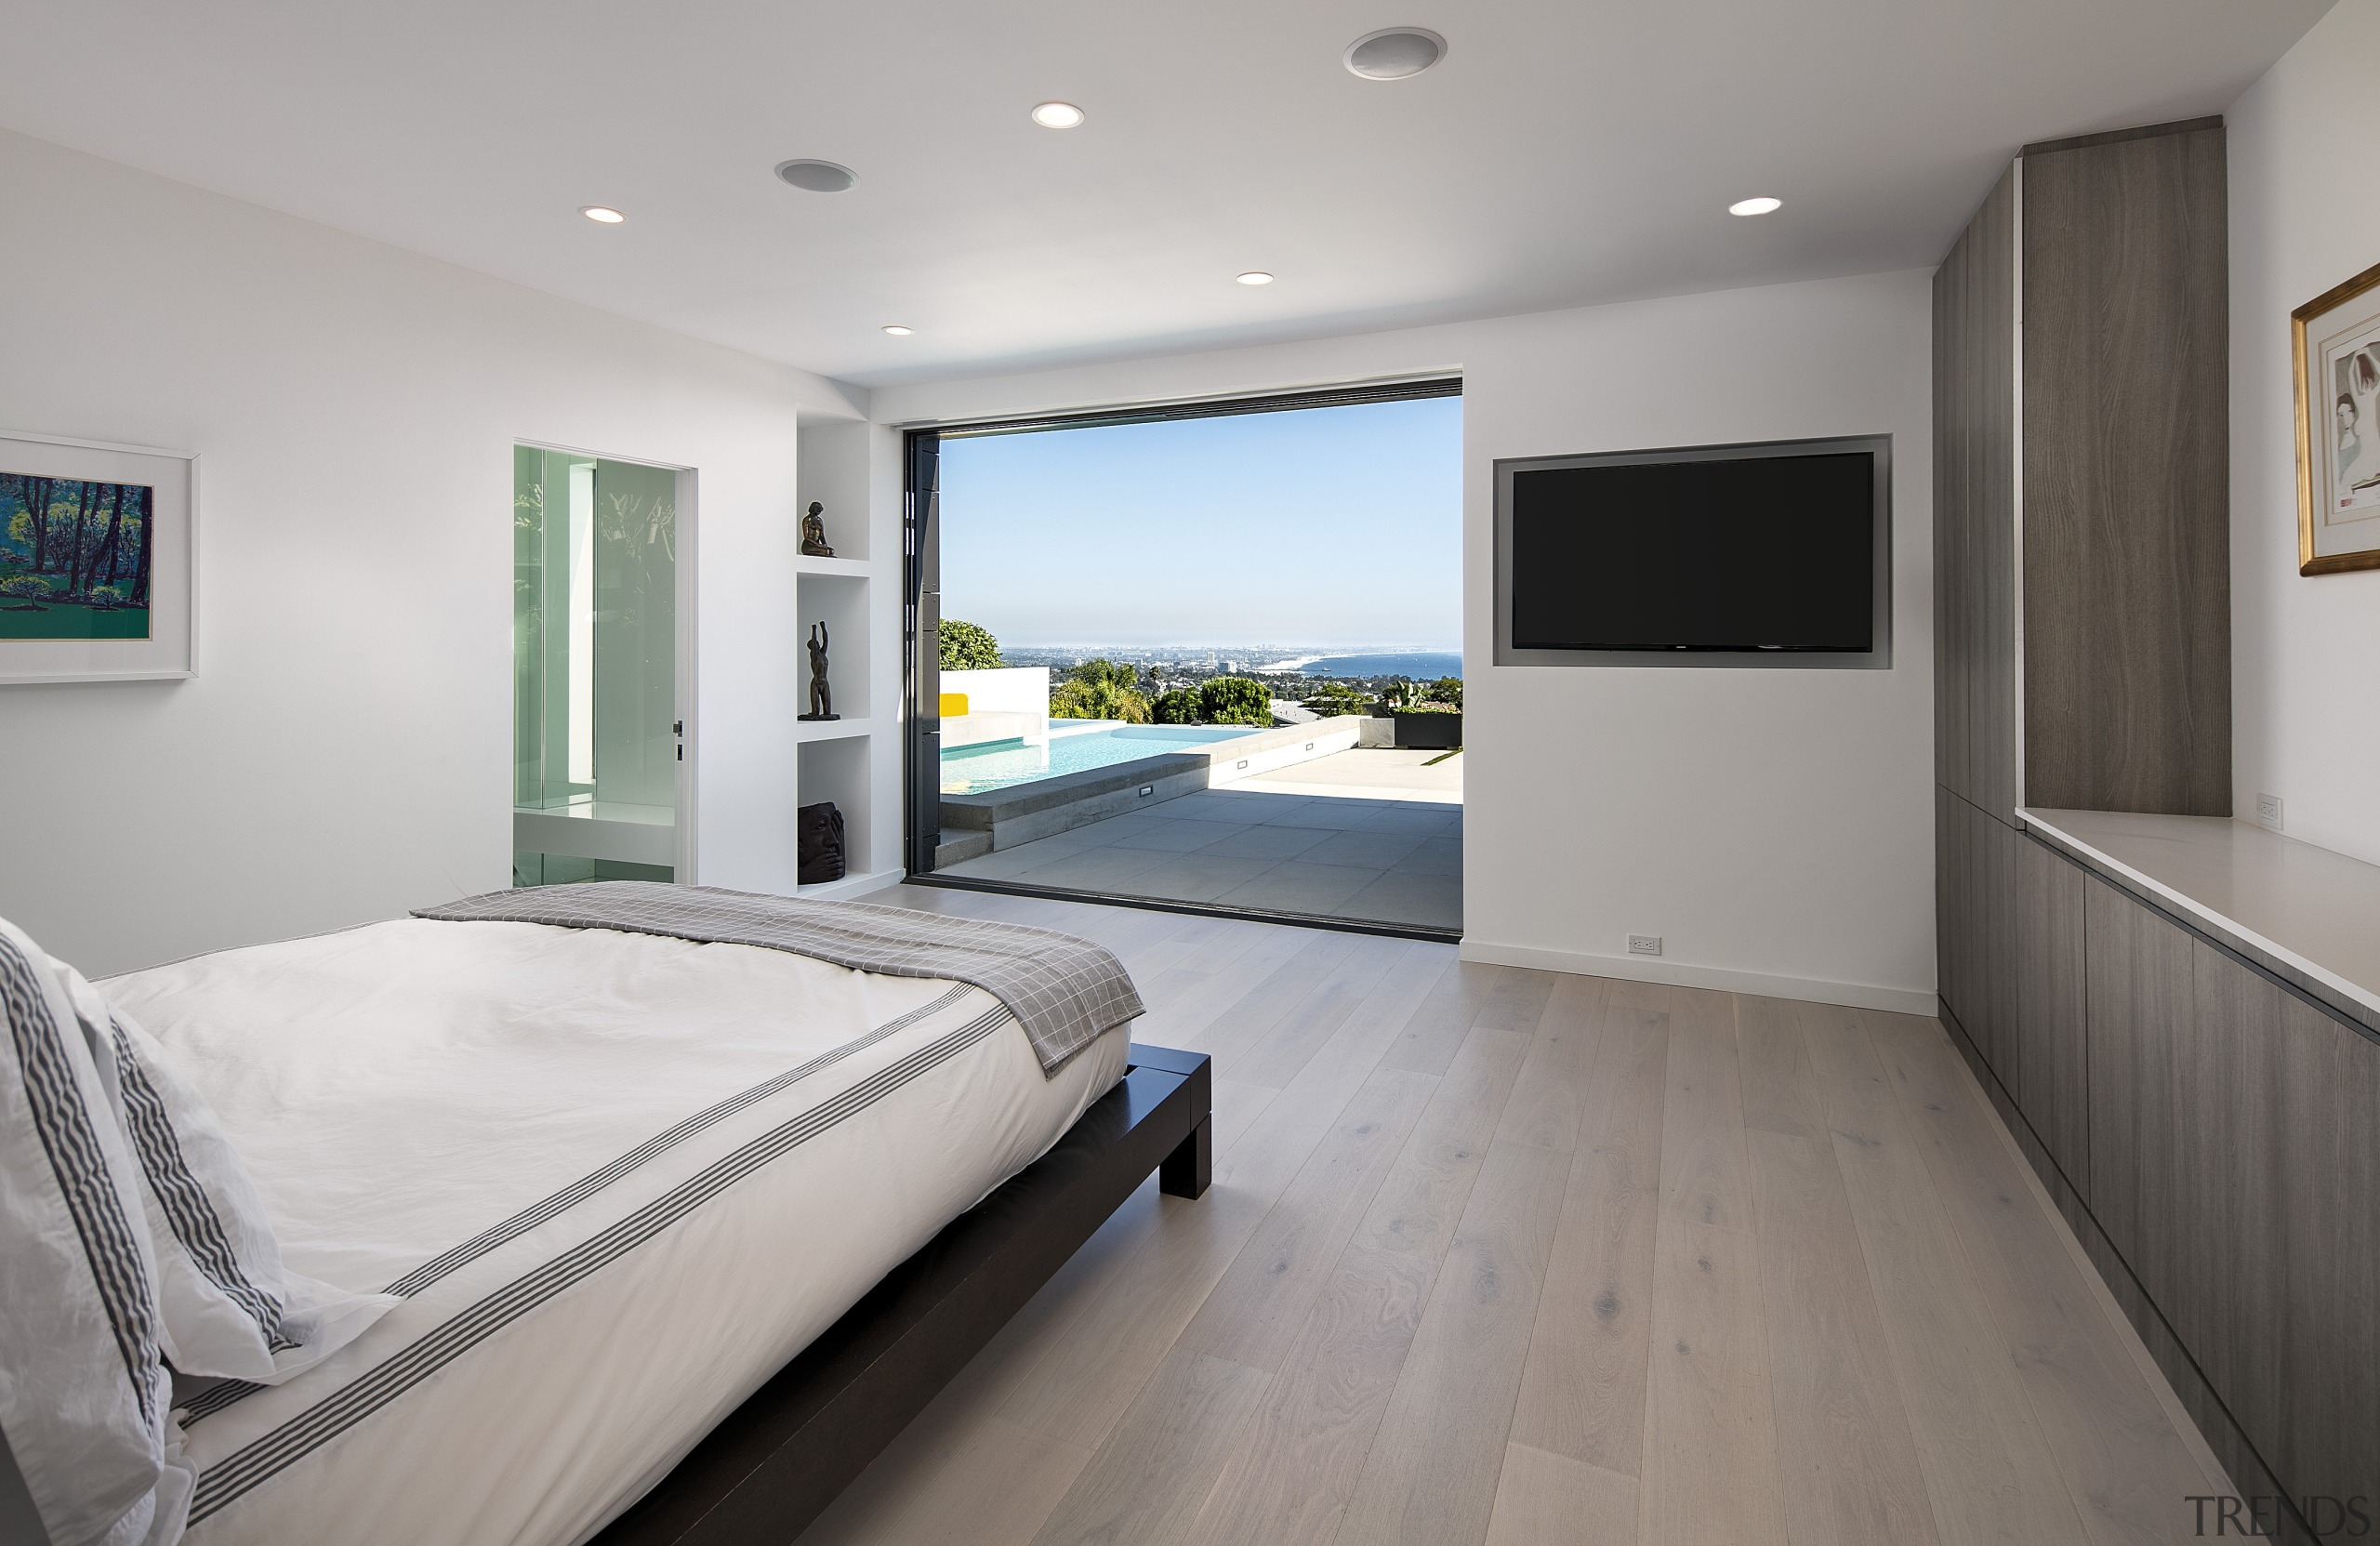 Two sliding glass panels pocket back into the bedroom, floor, interior design, property, real estate, room, window, gray